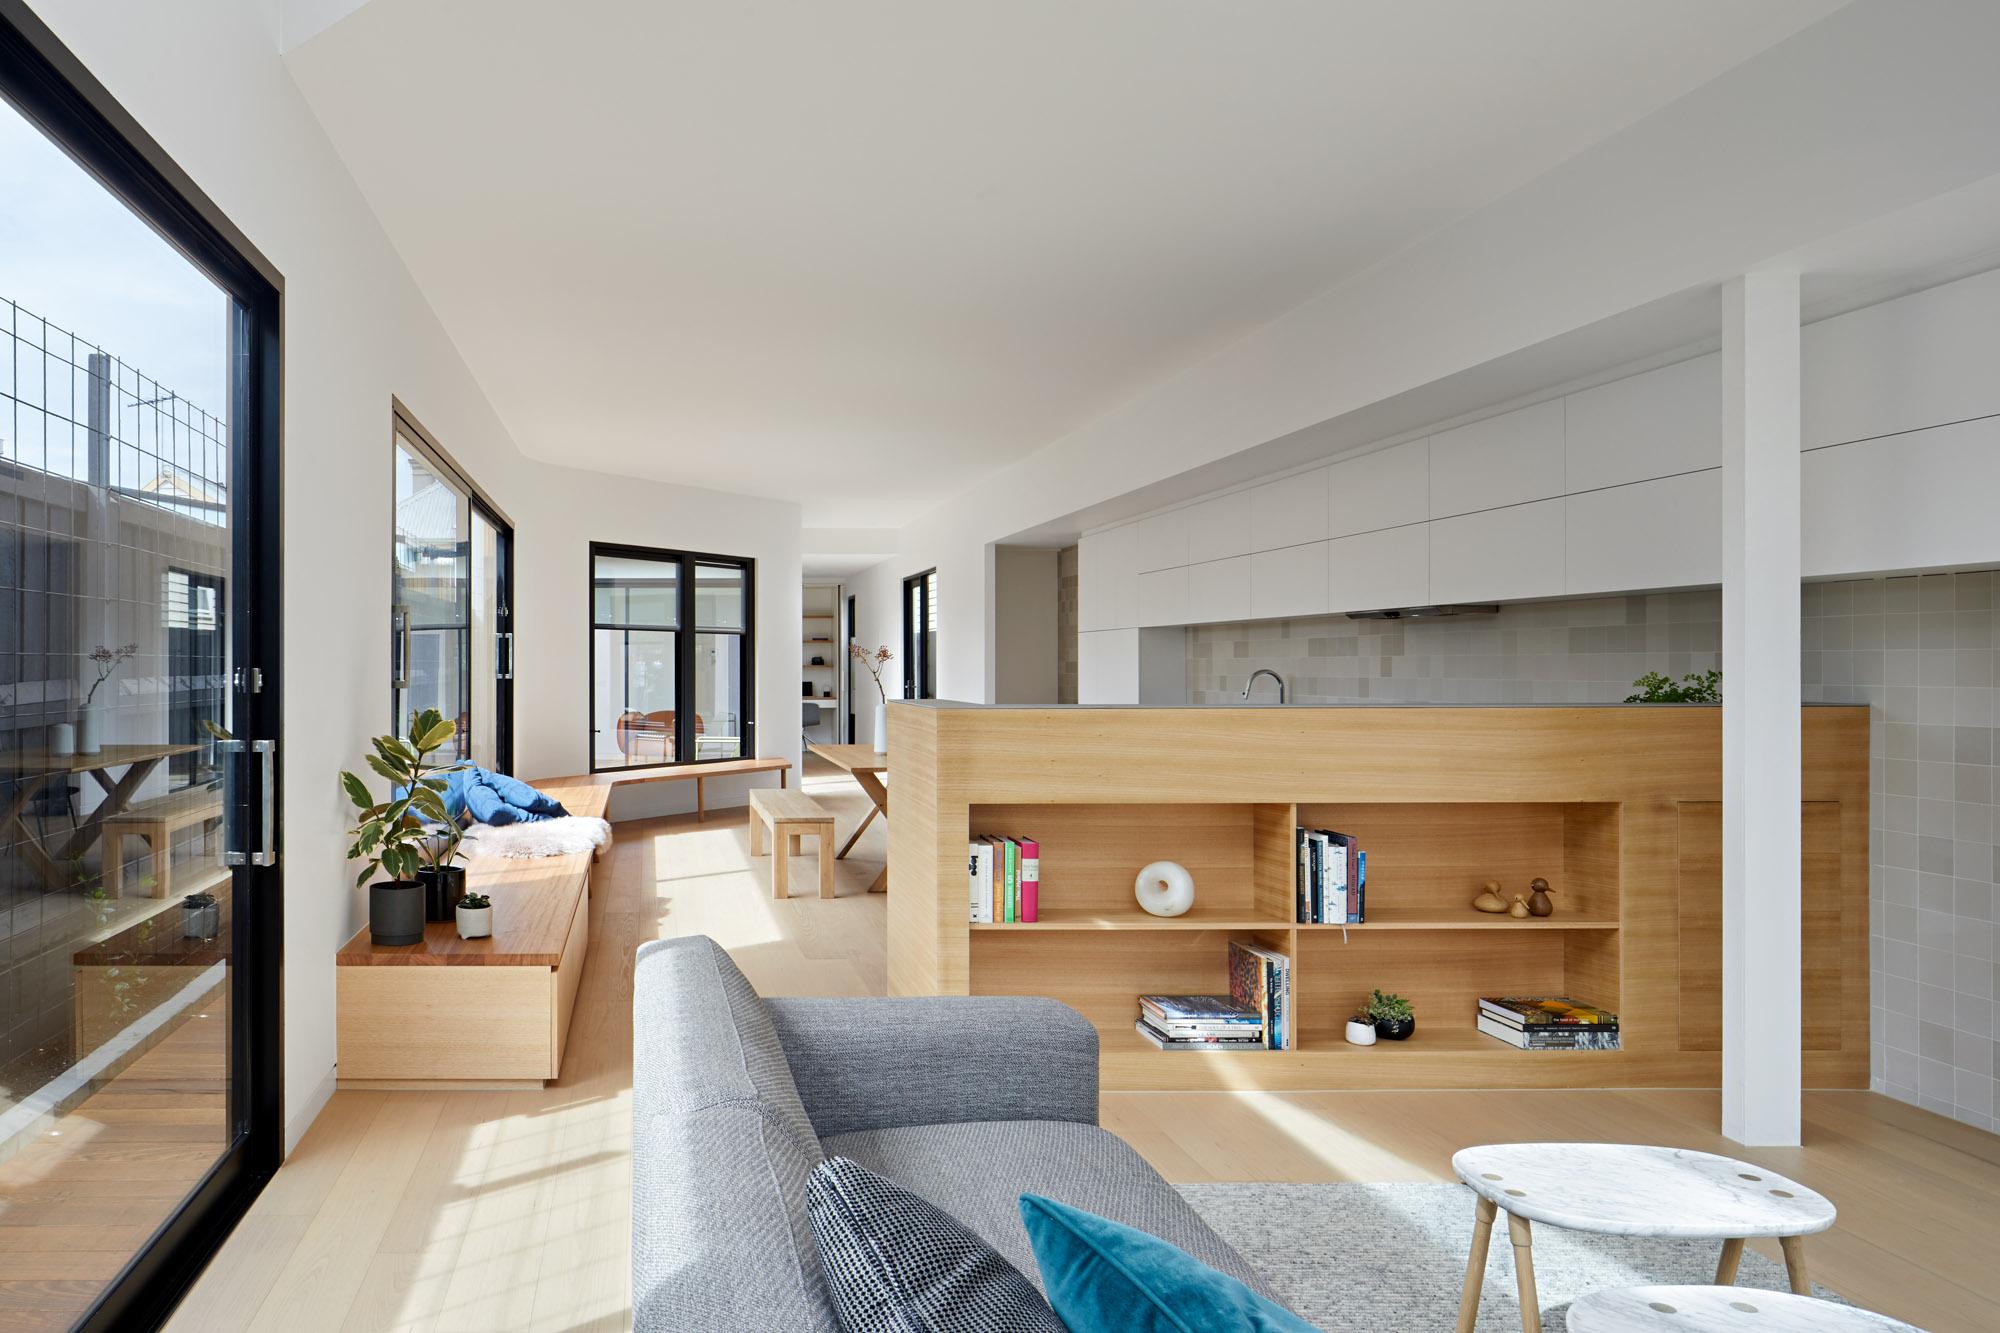 Roam Architects